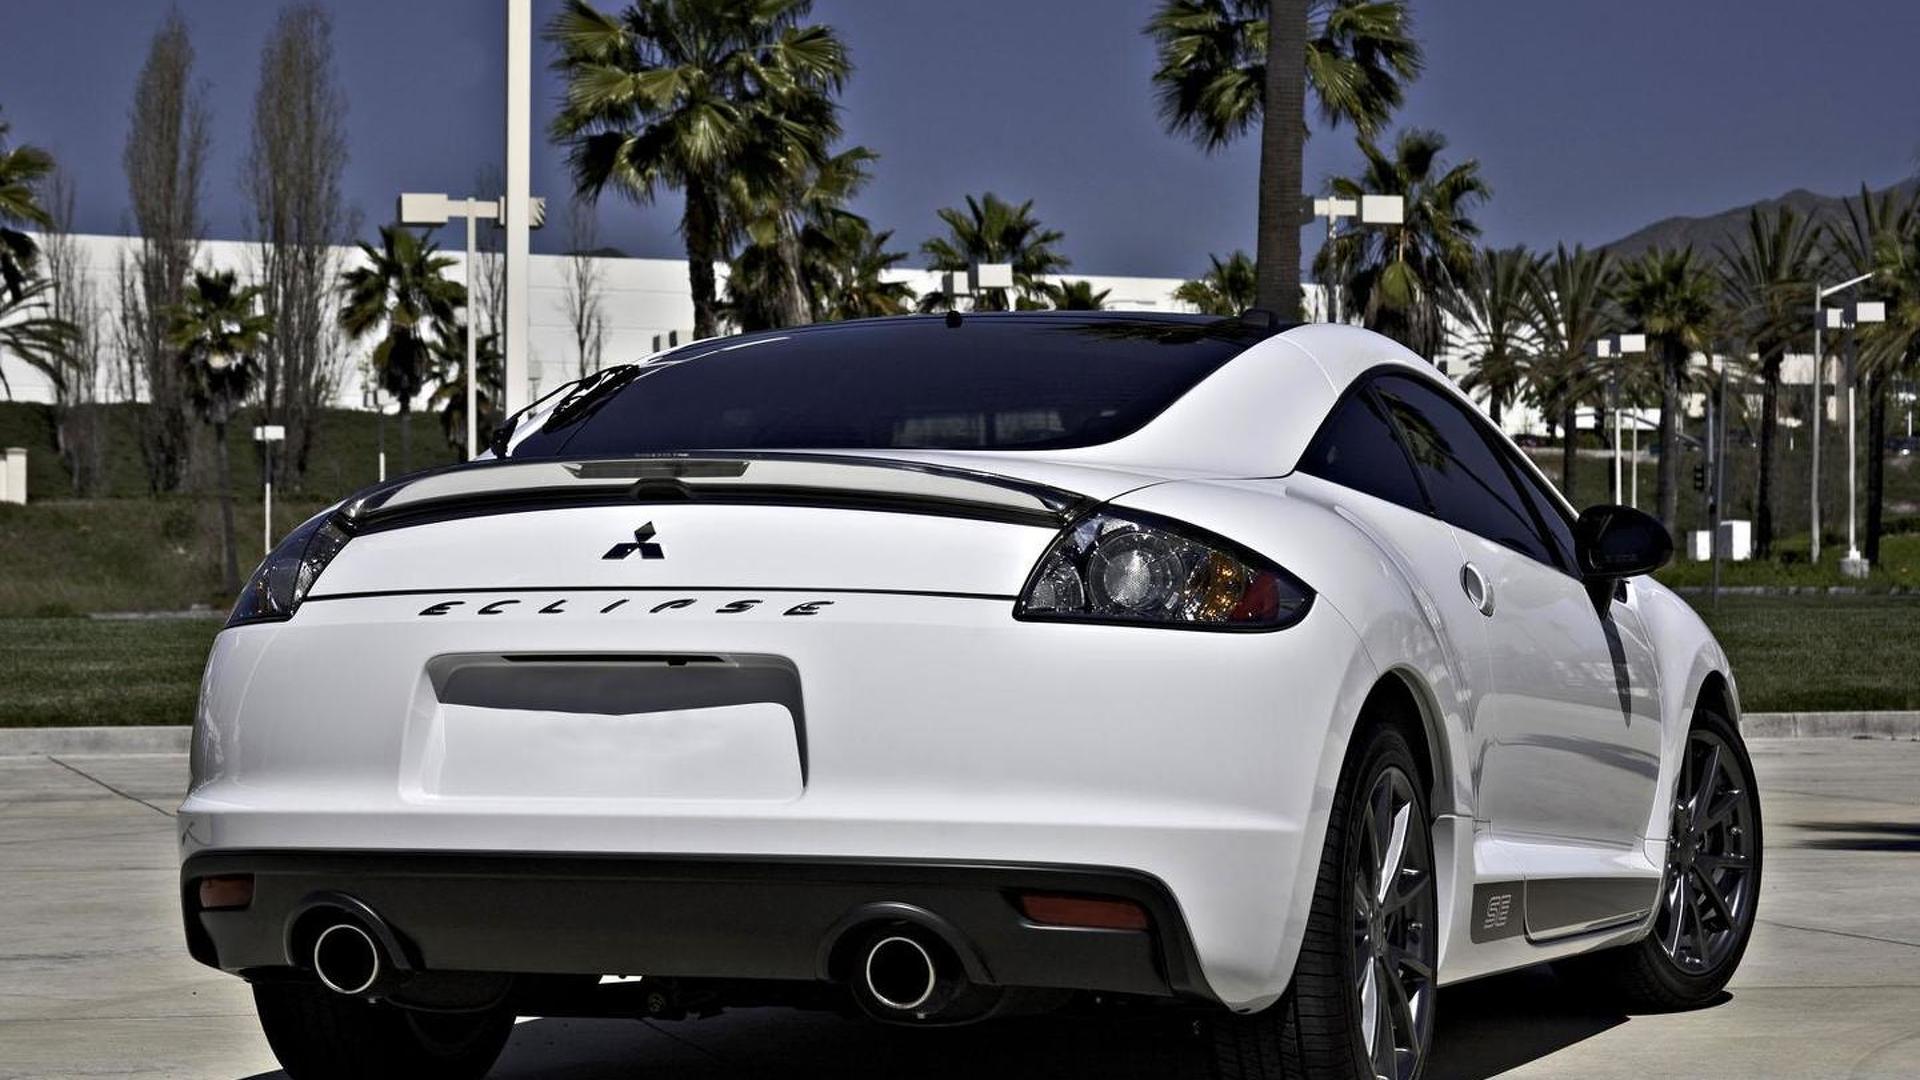 Mitsubishi Eclipse revival remains a possibility - report